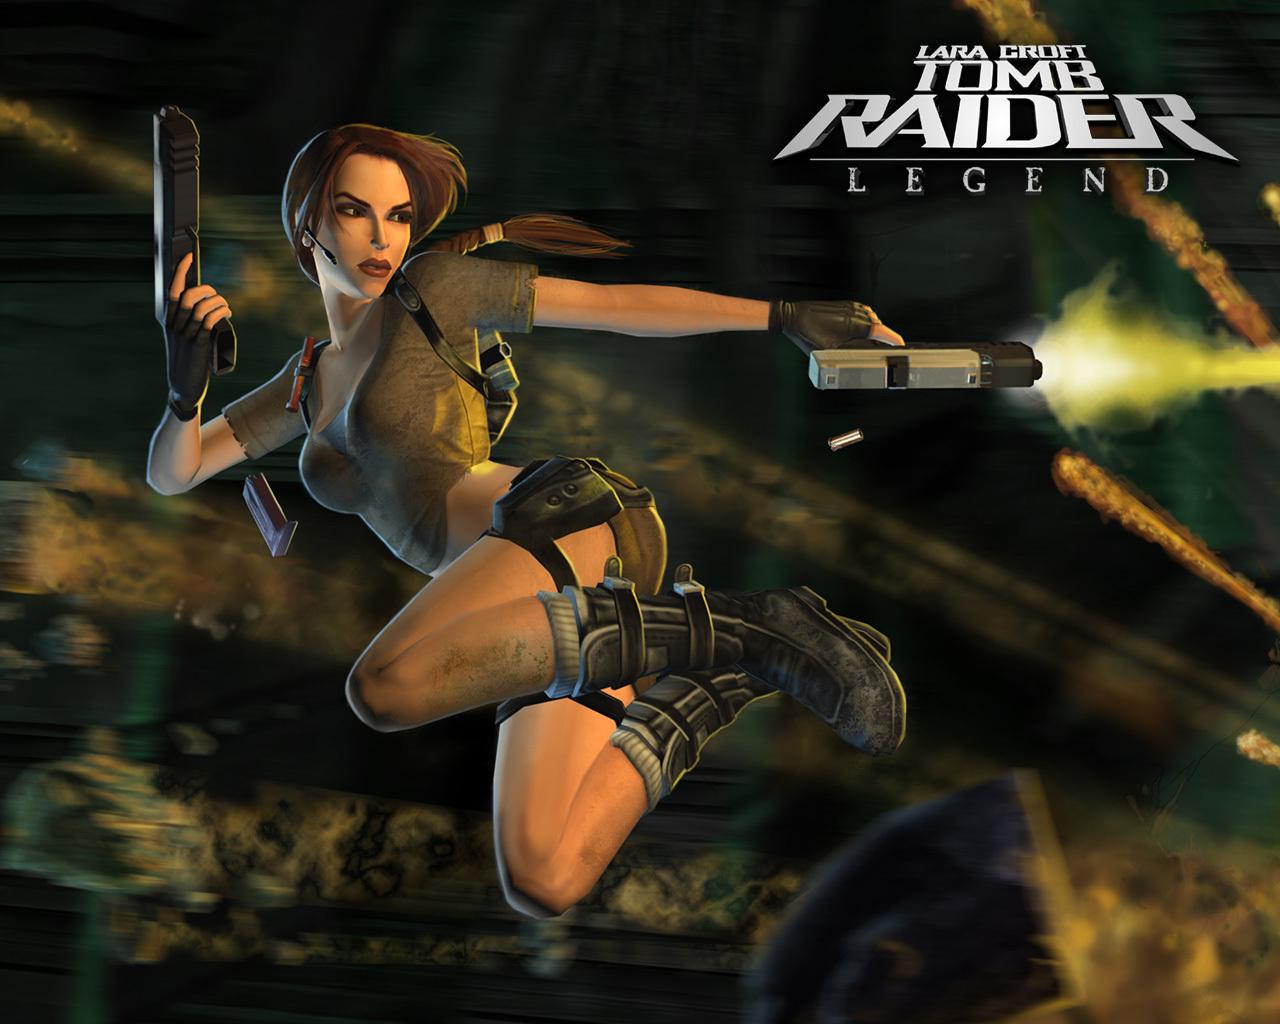 Tomb raider lara croft porn - 1 5